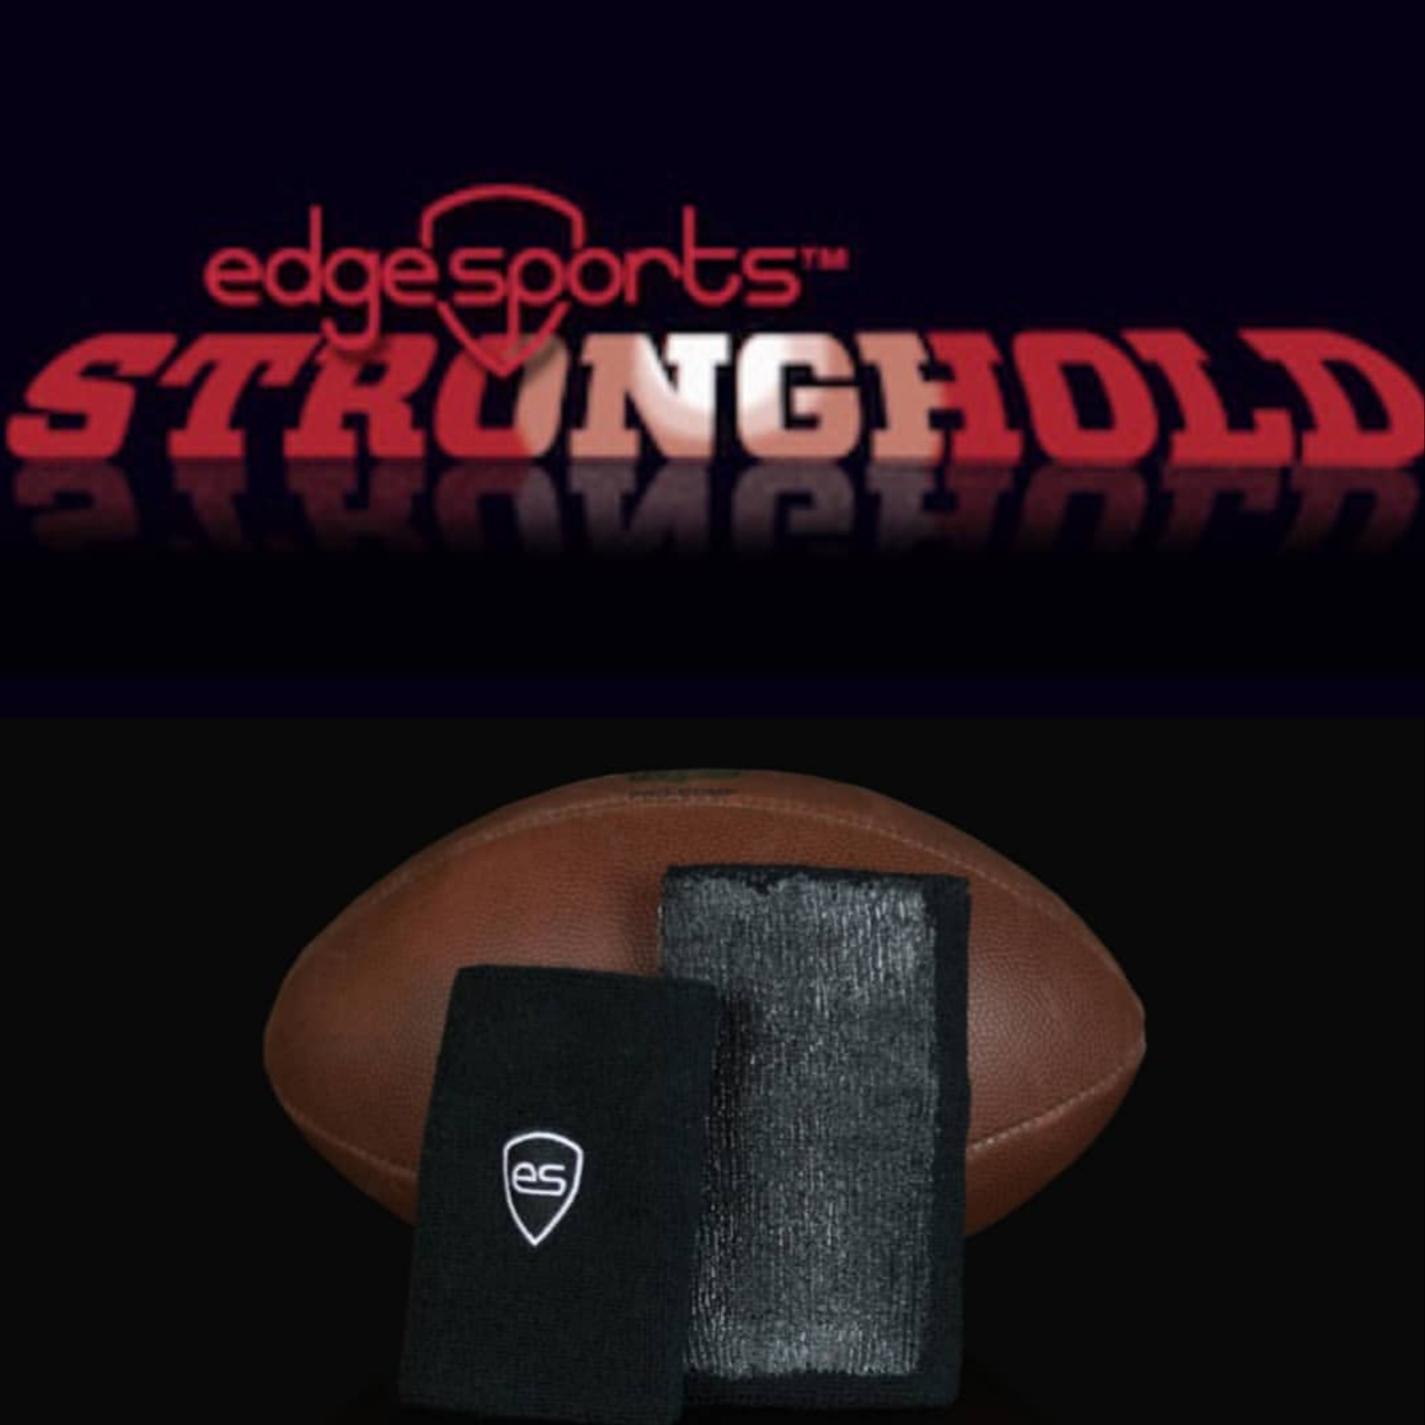 edge logo with product.jpg